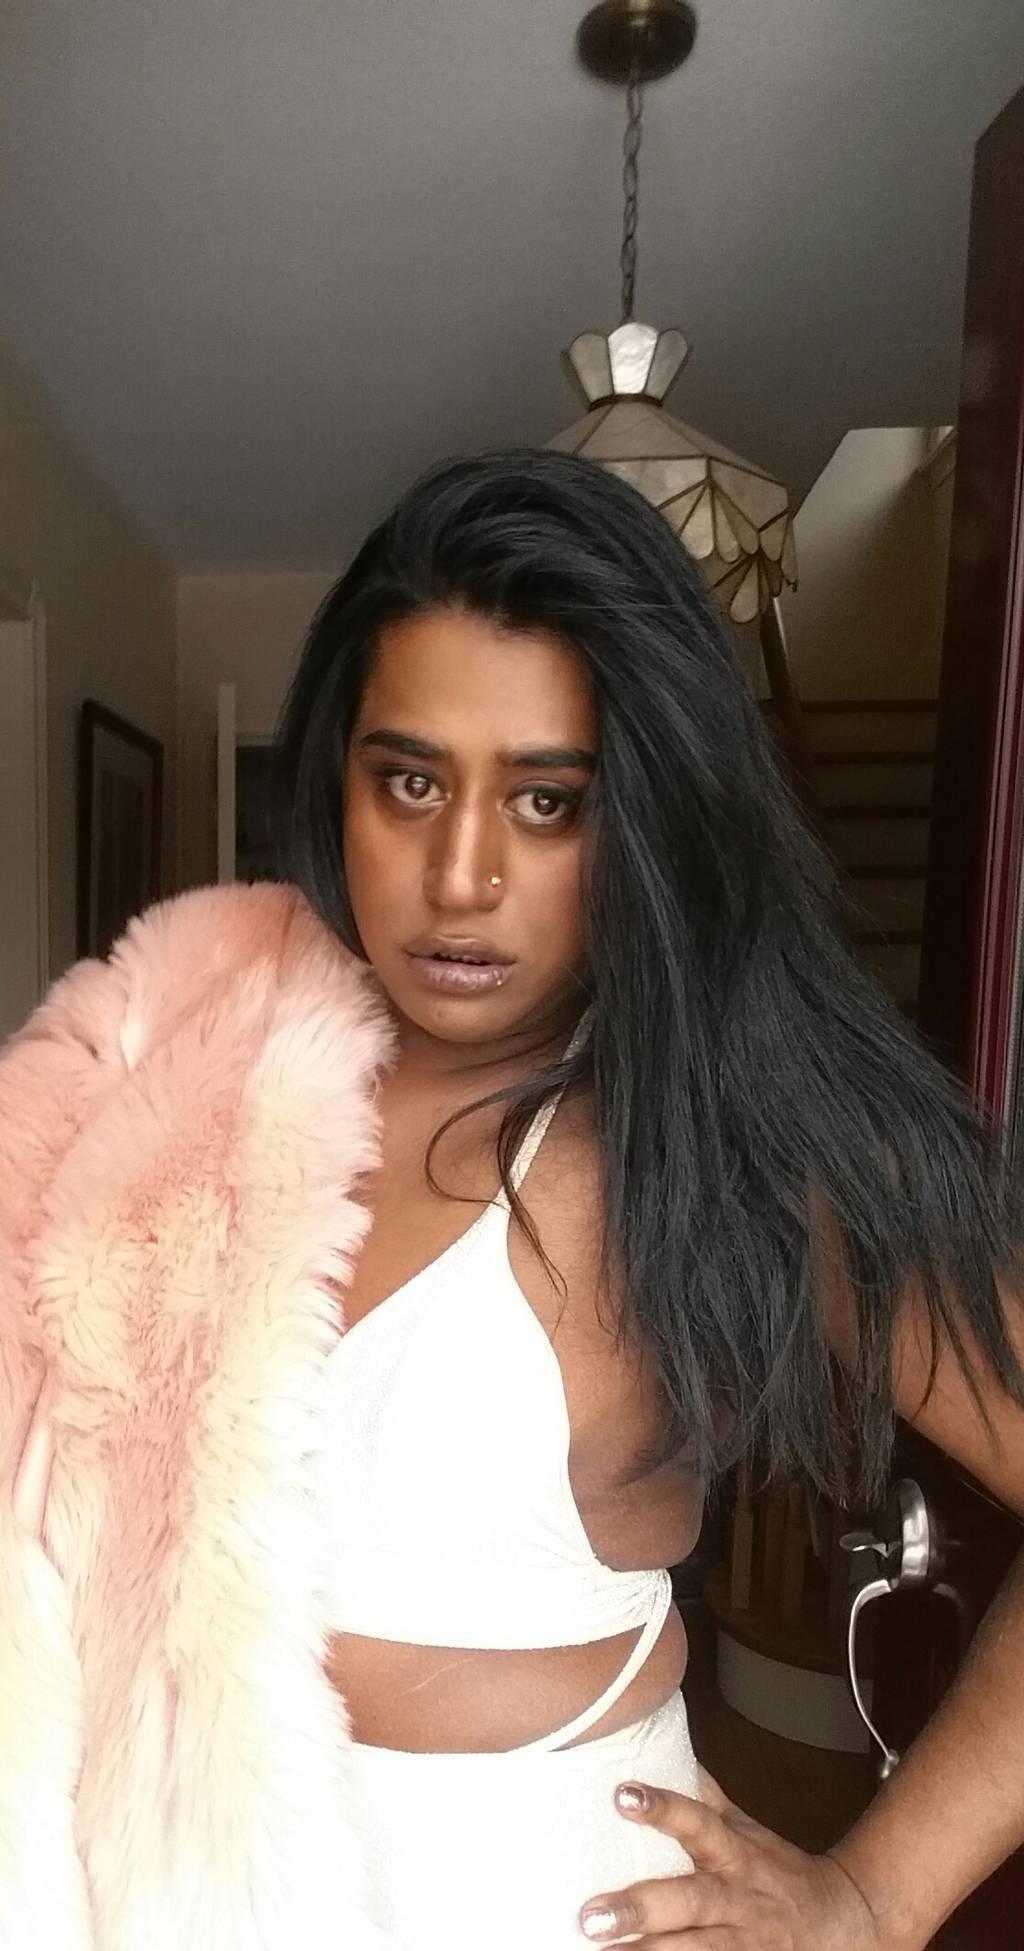 Sexy petite ladyboy in Toronto 6474923190Sexy petite